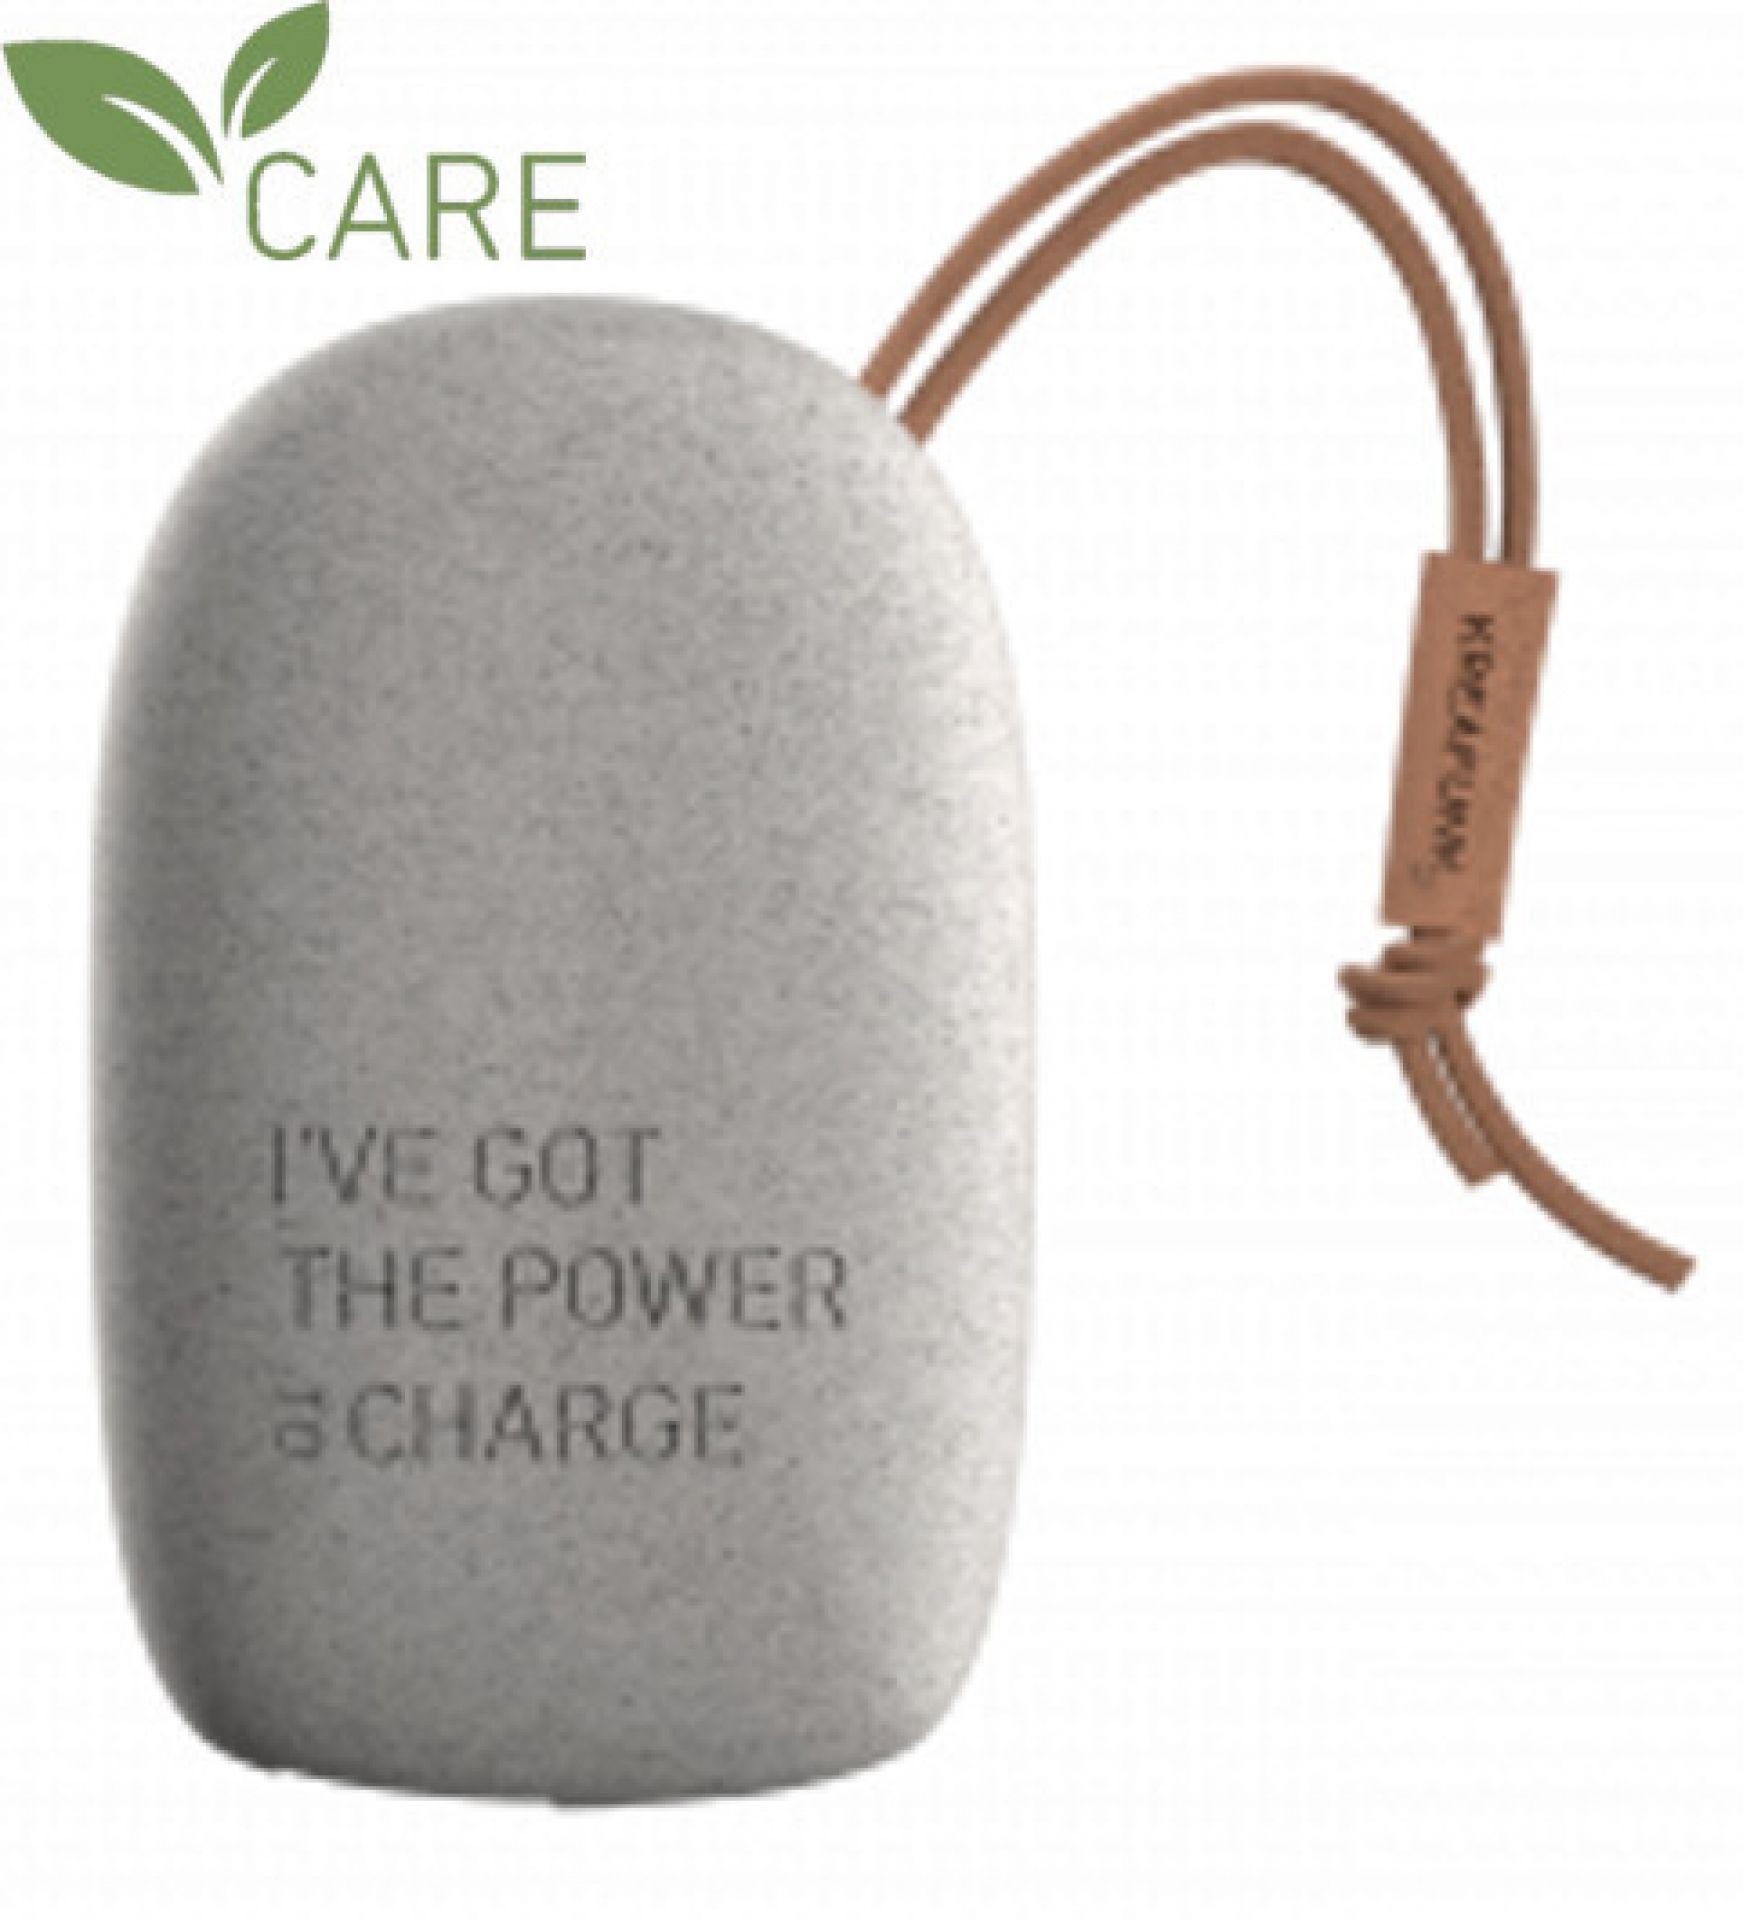 toCHARGE Care Powerbank Kreafunk